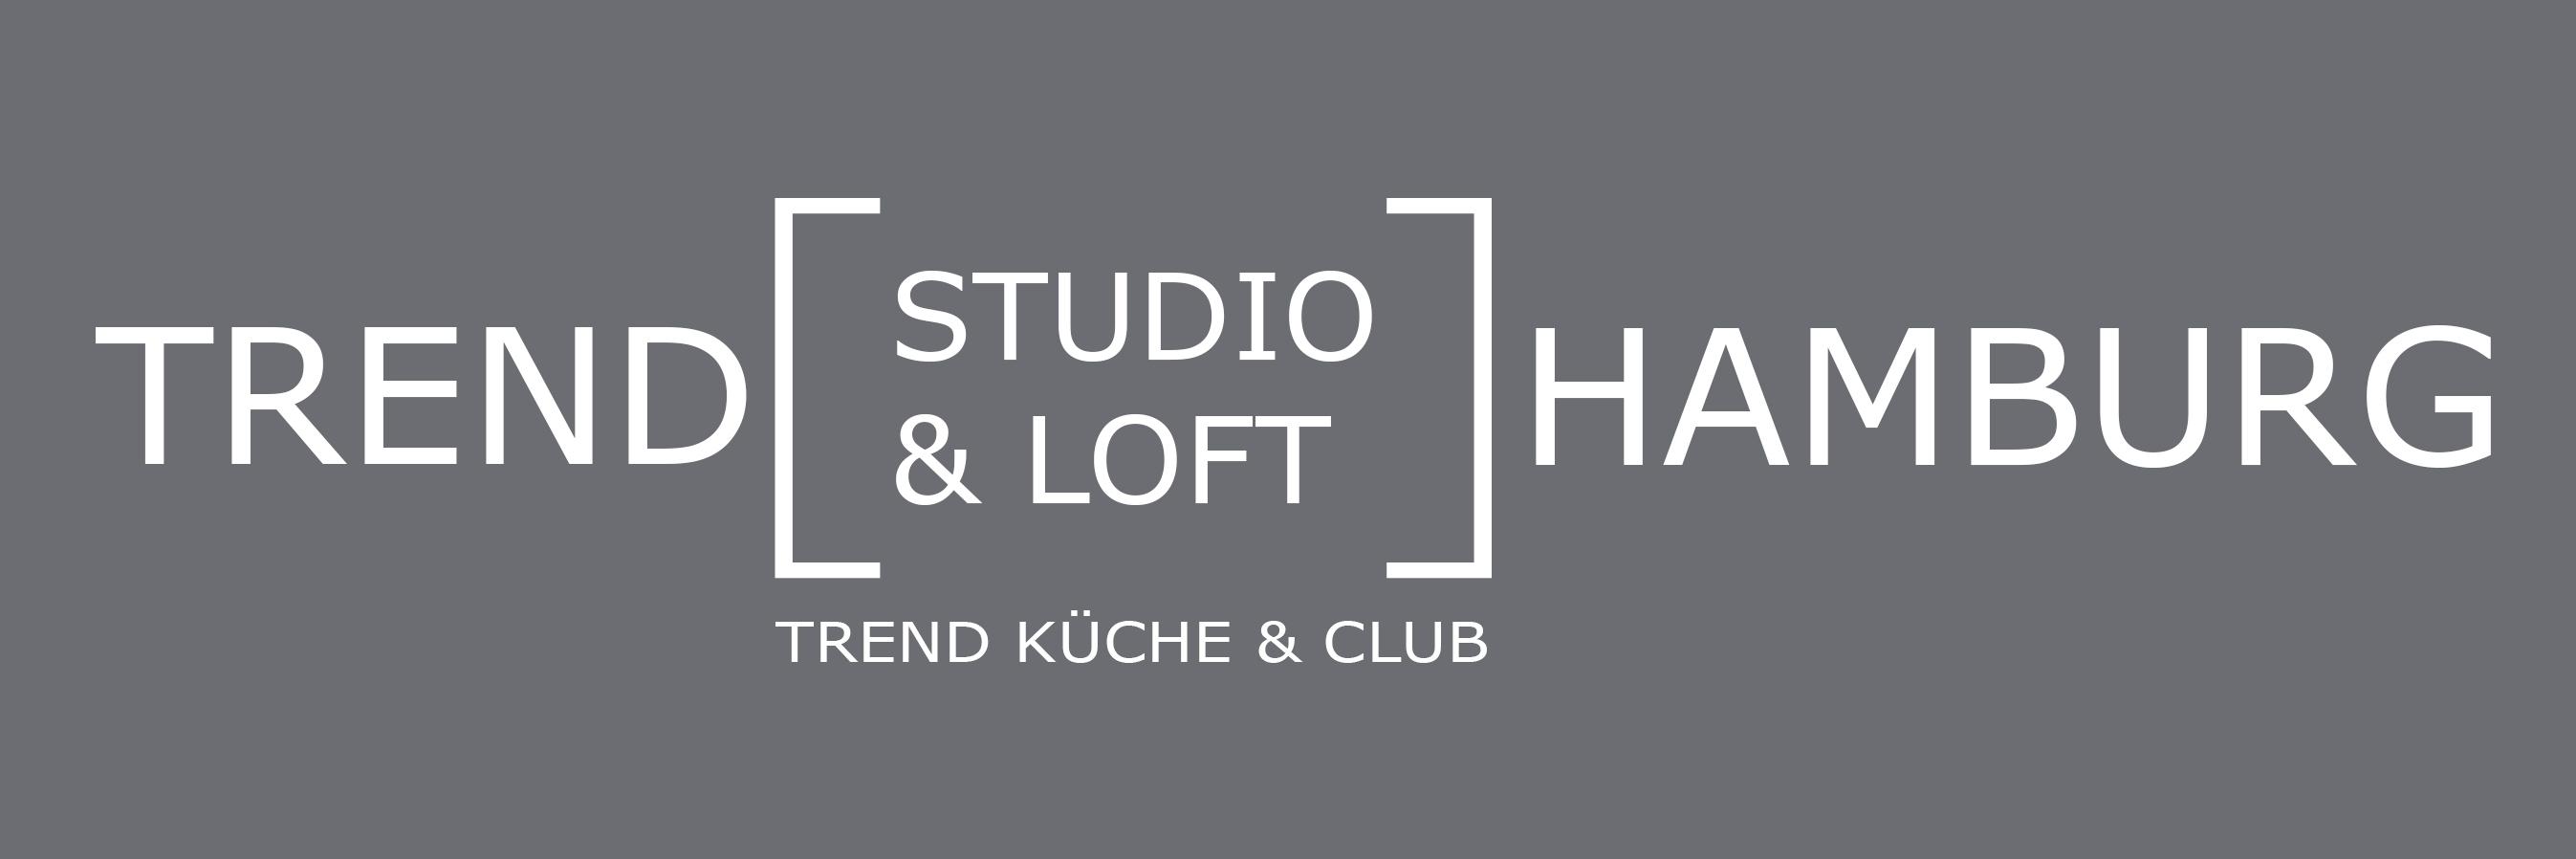 Trend [Studio & Loft]